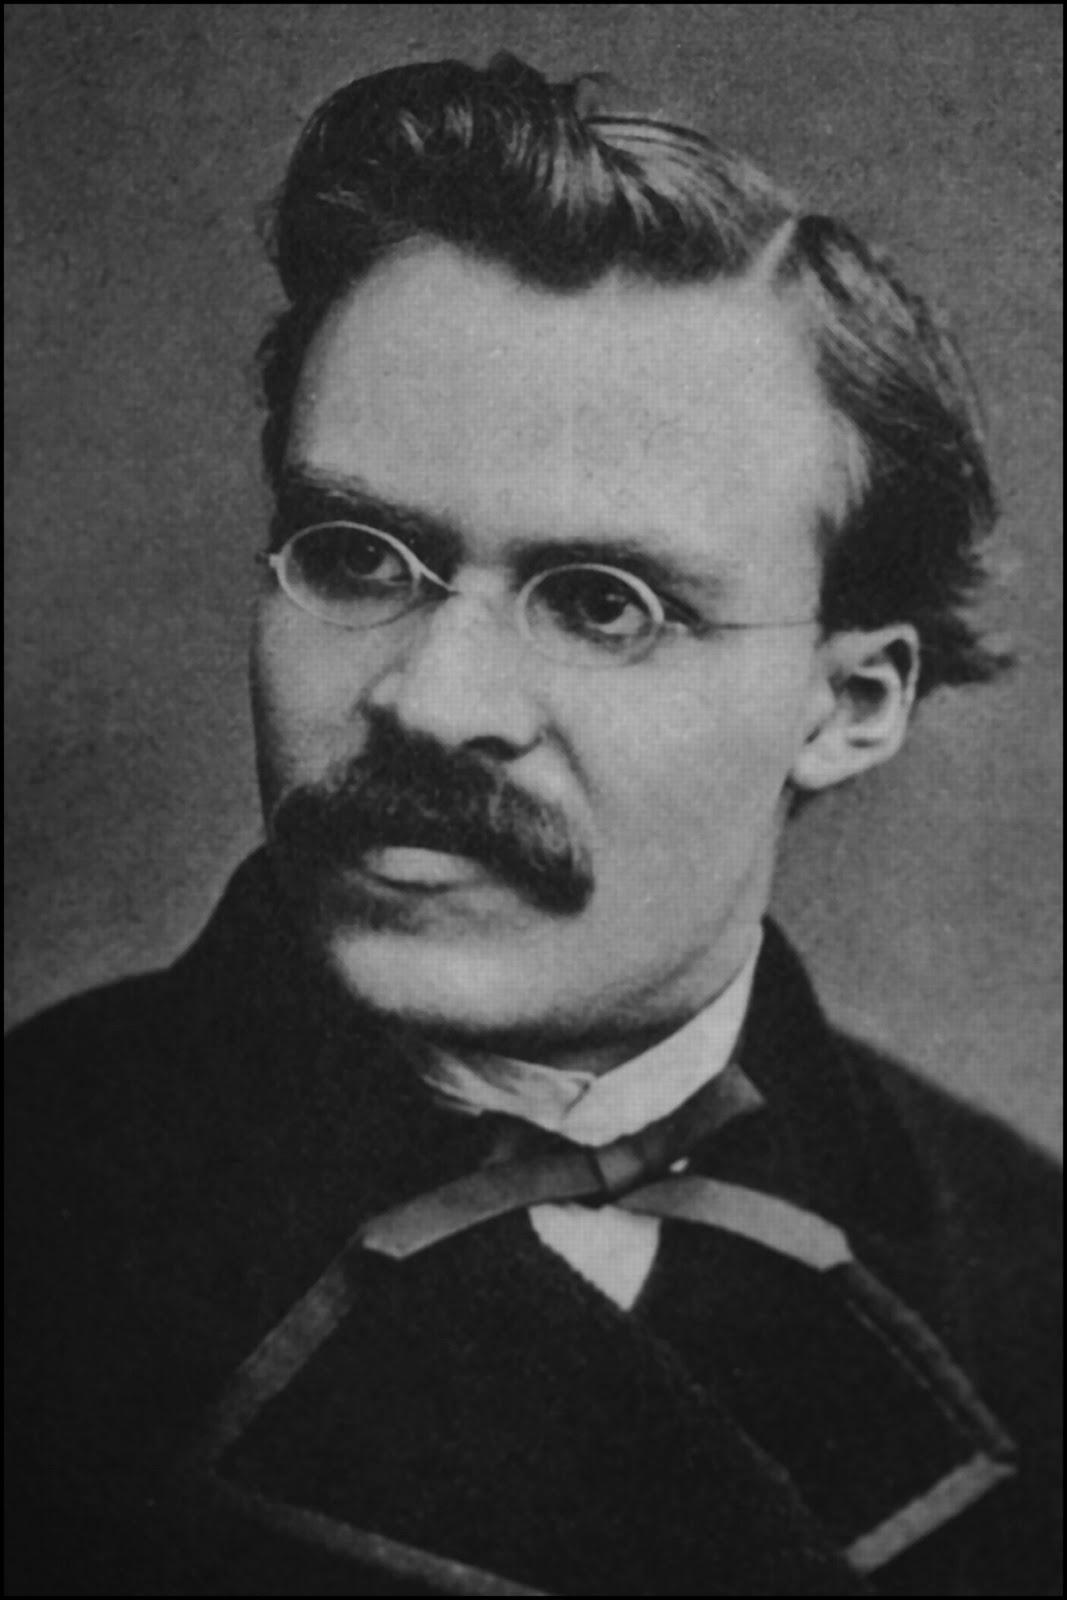 Richard Wagner Georg SoltiVienna Philharmonic Birgit Nilsson Wolfgang Windgassen Hans Hotter Gerhard